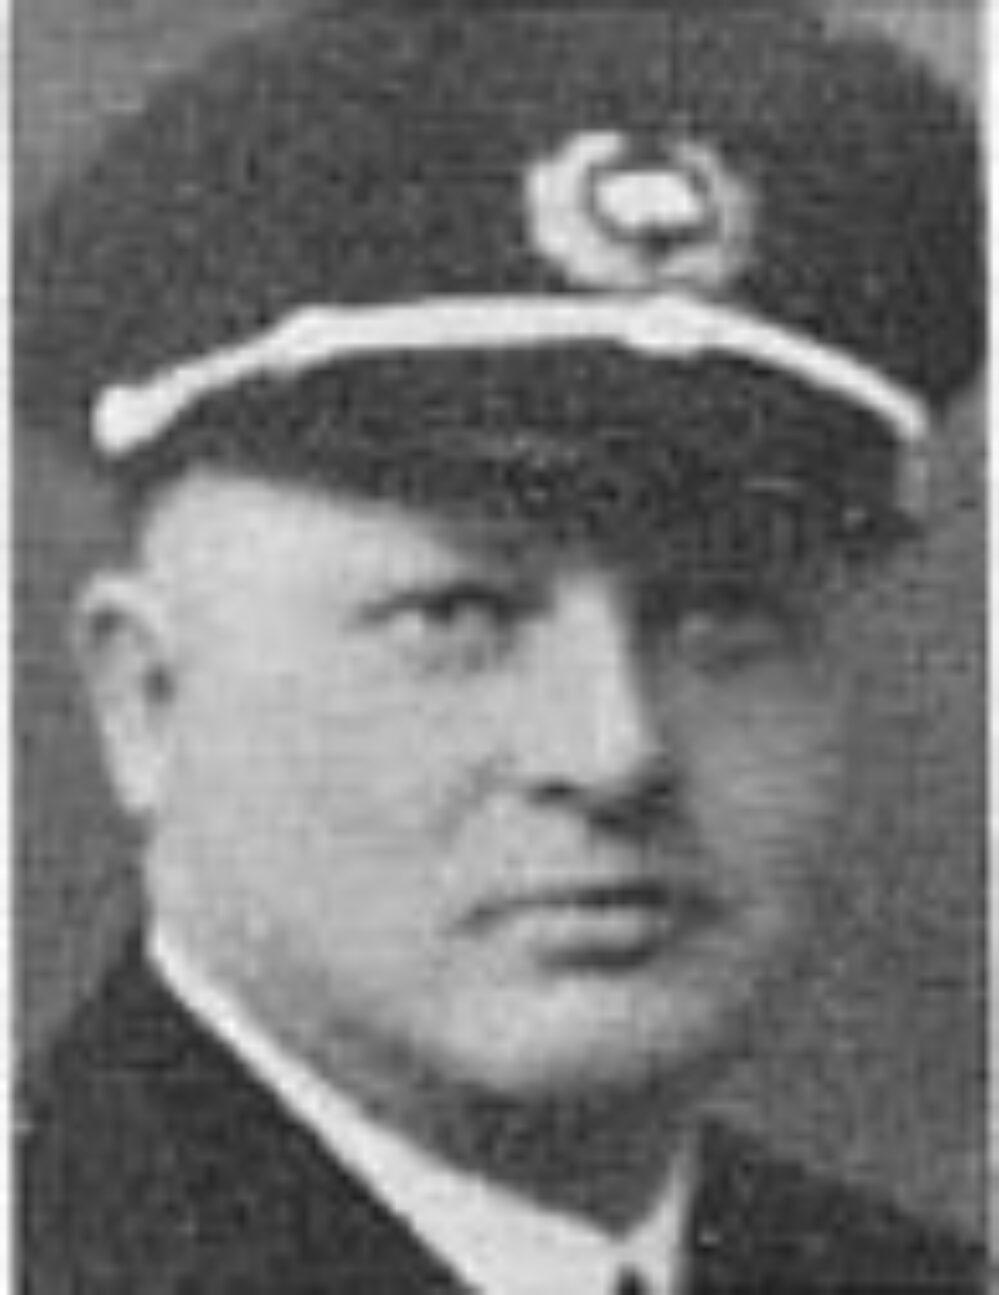 Nils Henrik Sjursen